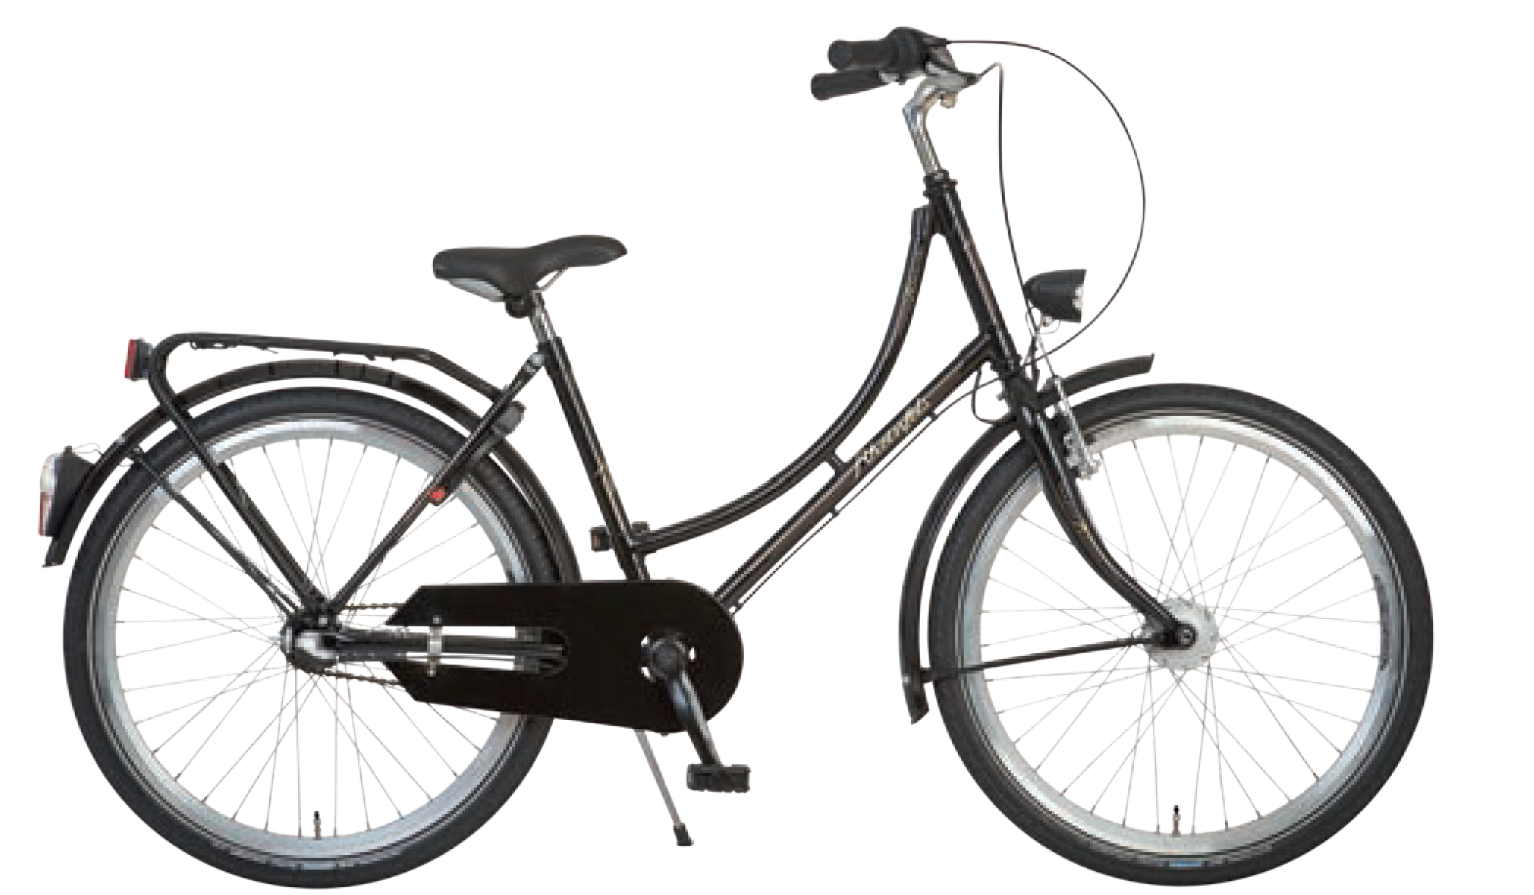 rheinfels hollandrad 24 zoll 3 gang schwarz greenbike. Black Bedroom Furniture Sets. Home Design Ideas